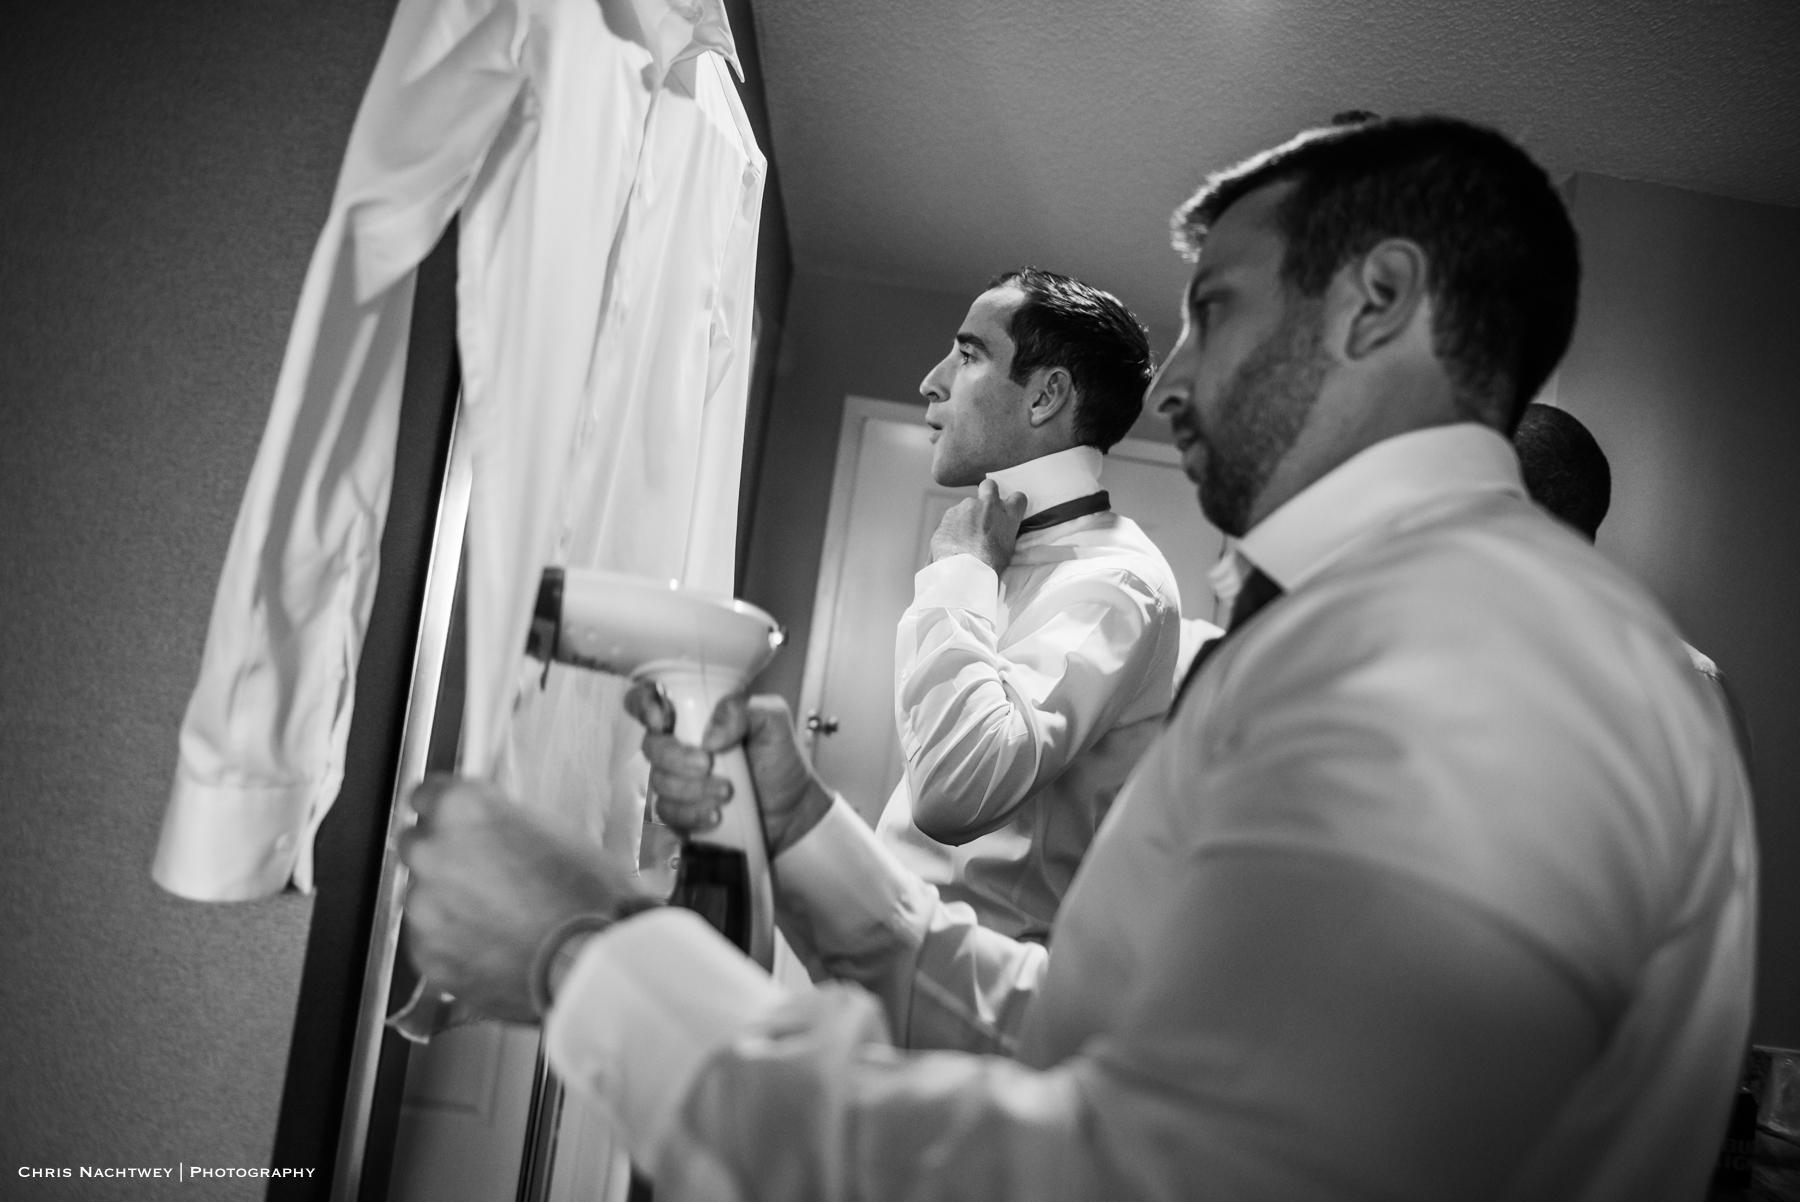 photos-wedding-quidnessett-country-club-ri-chris-nachtwey-photography-2018-4.jpg